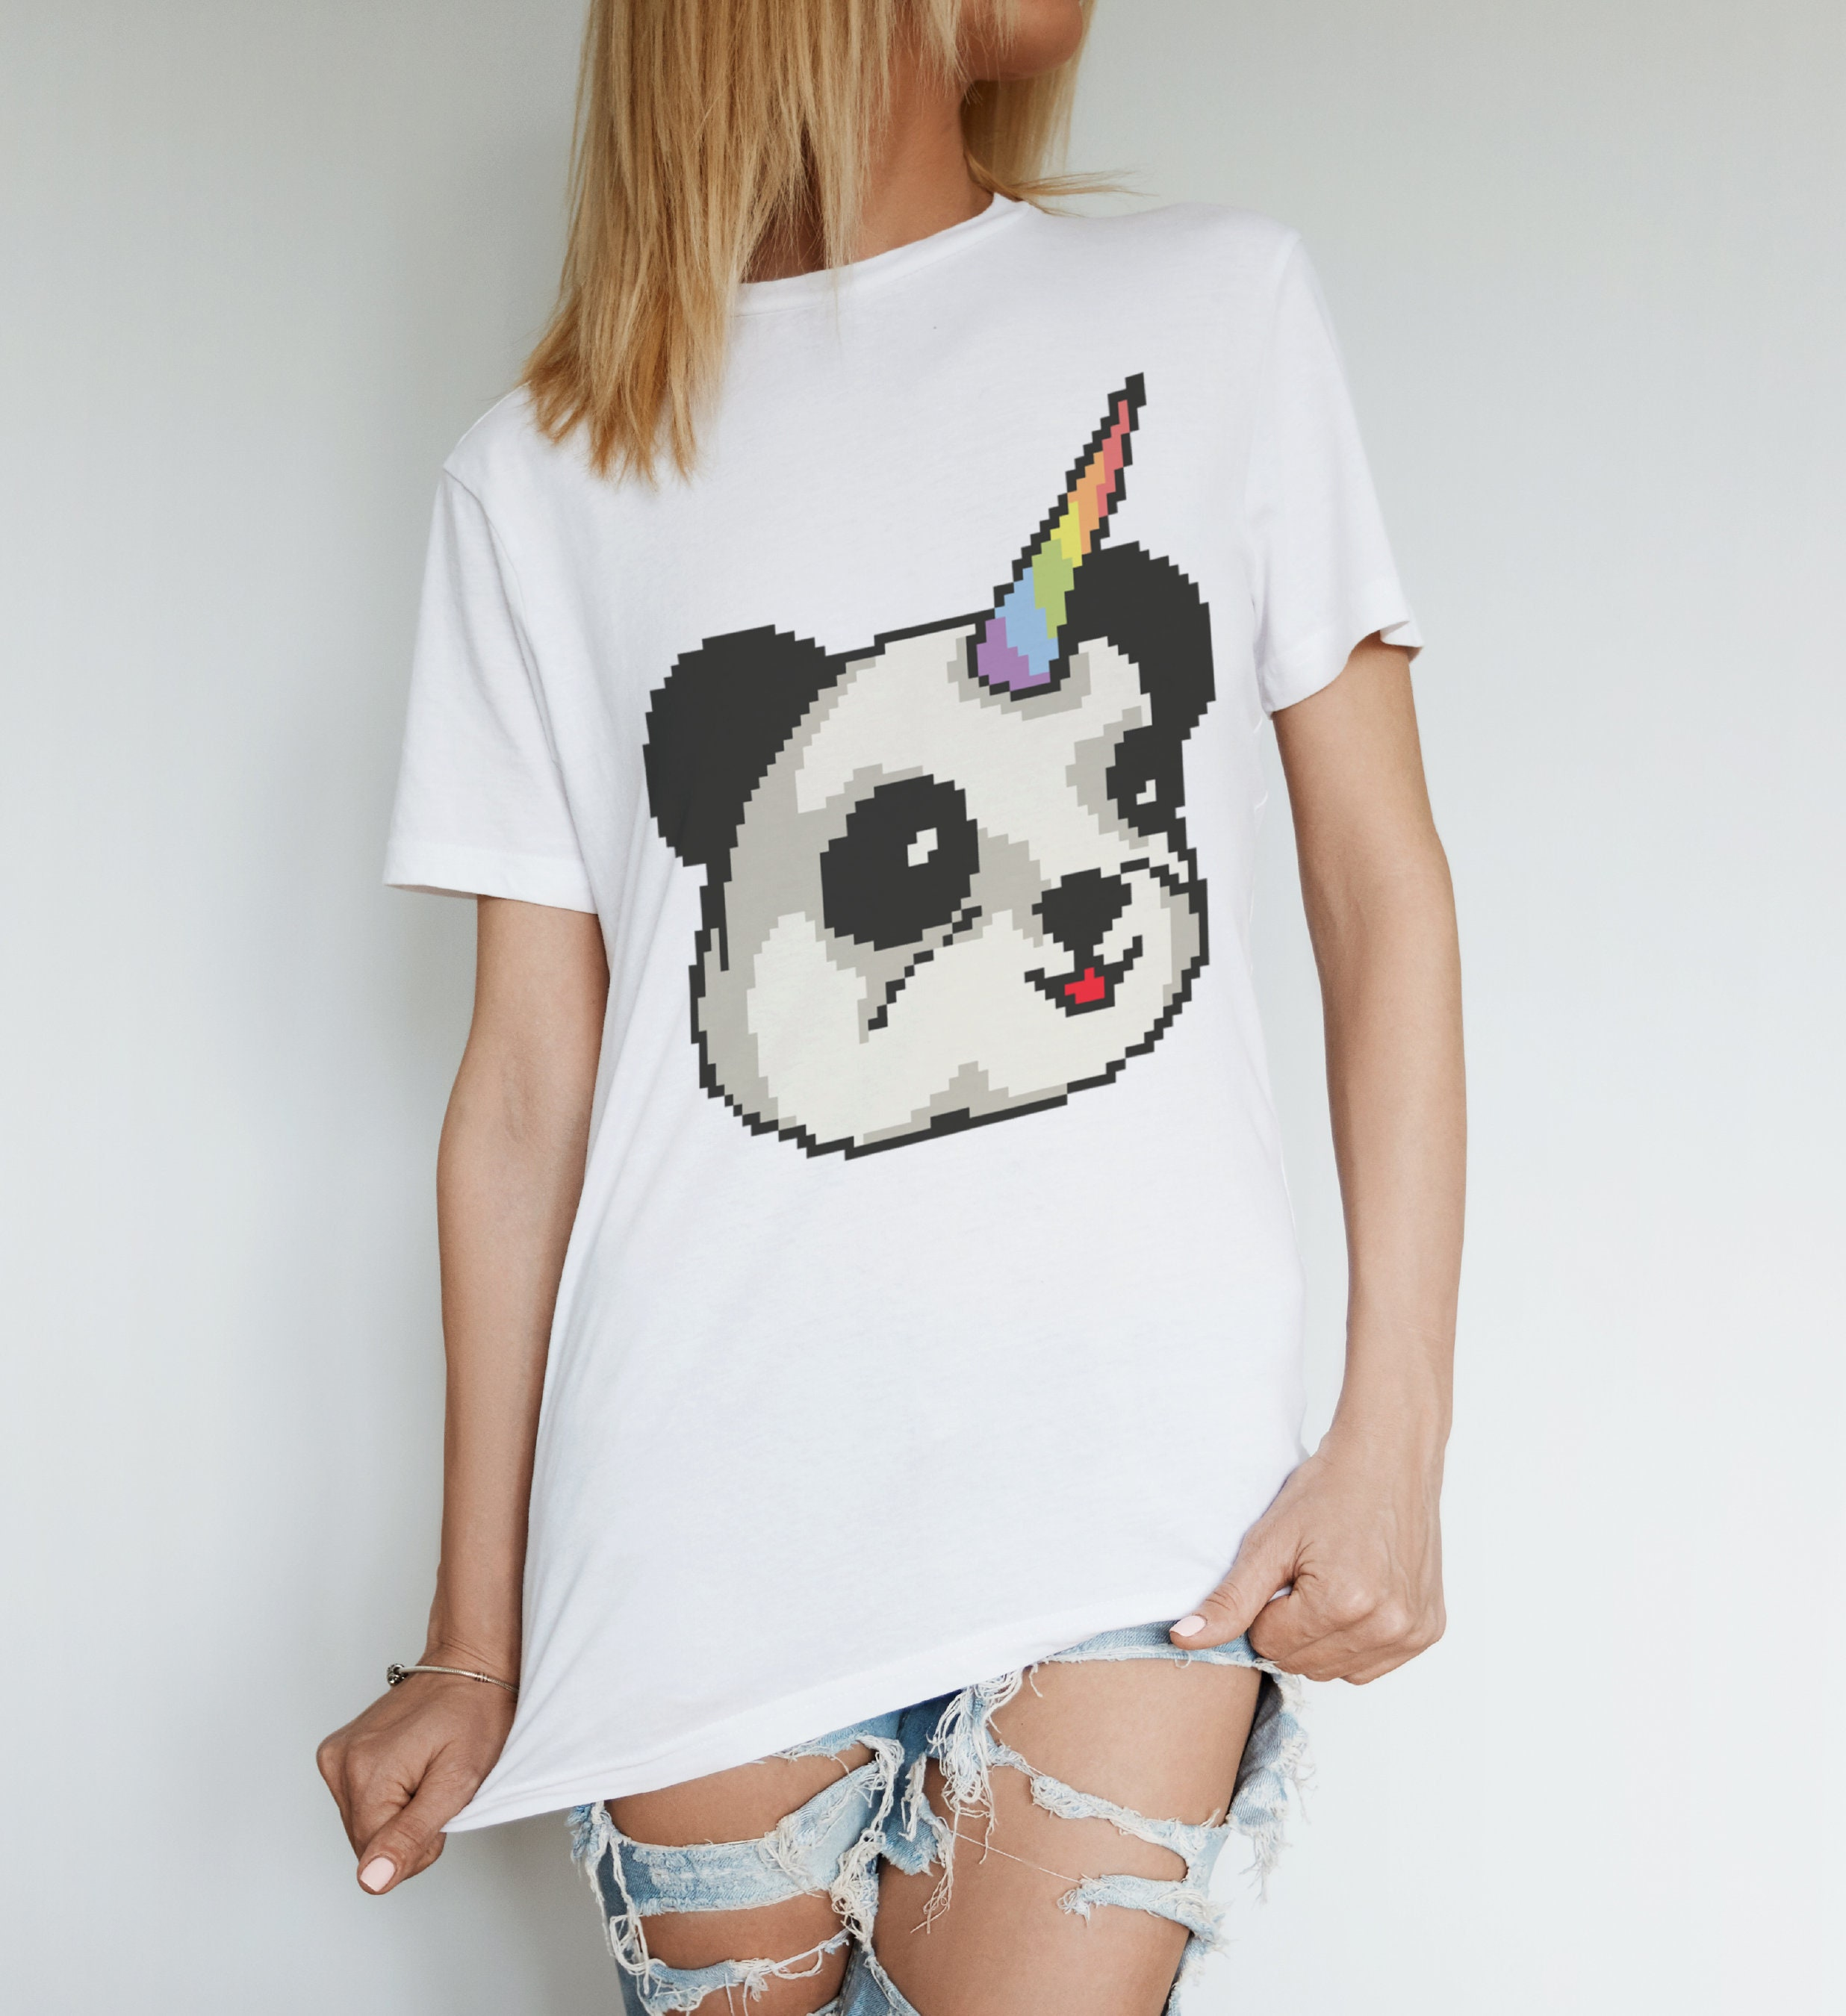 Pandacorn T-shirt, 8 Bit Panda Panda Bit T-shirt, Licorne, T-Shirt graphique, illustration, coton bio 19b53d